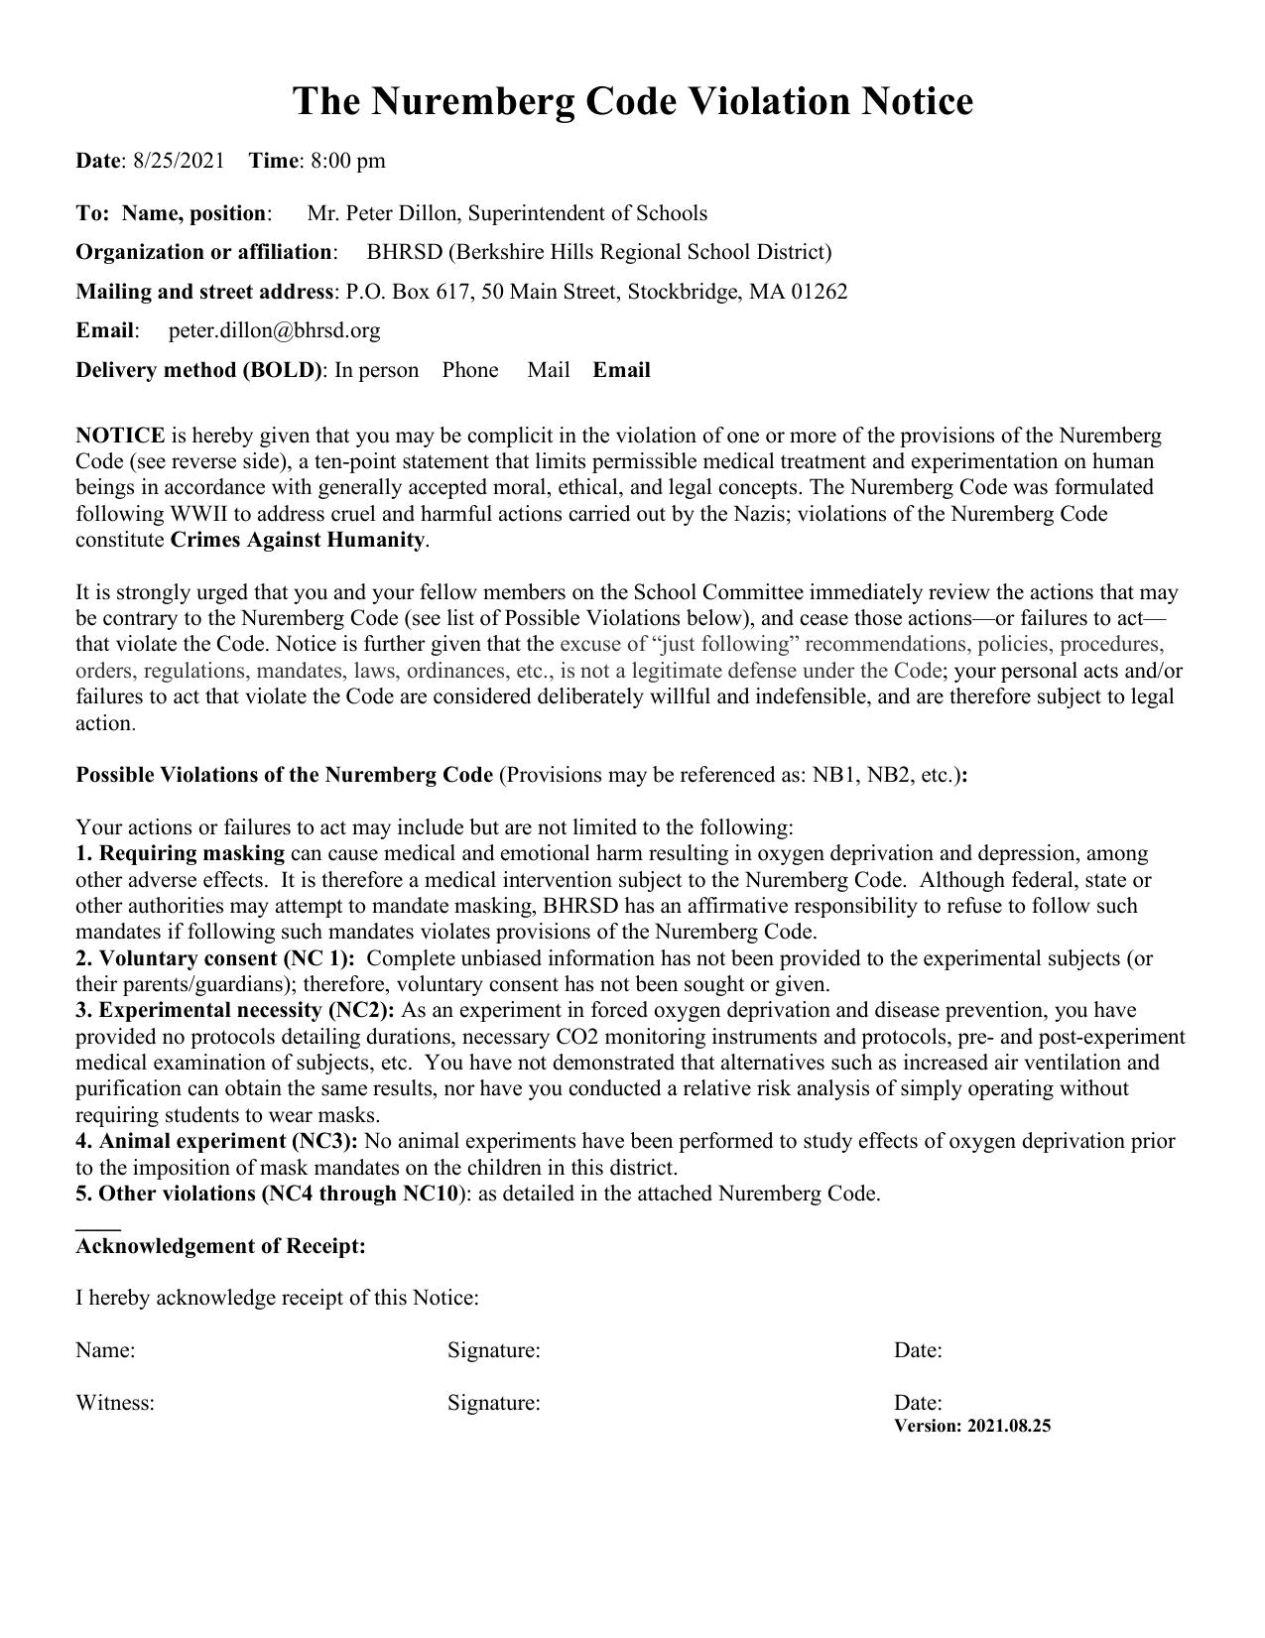 Nuremberg violation notice sent to Berkshire Hills officials